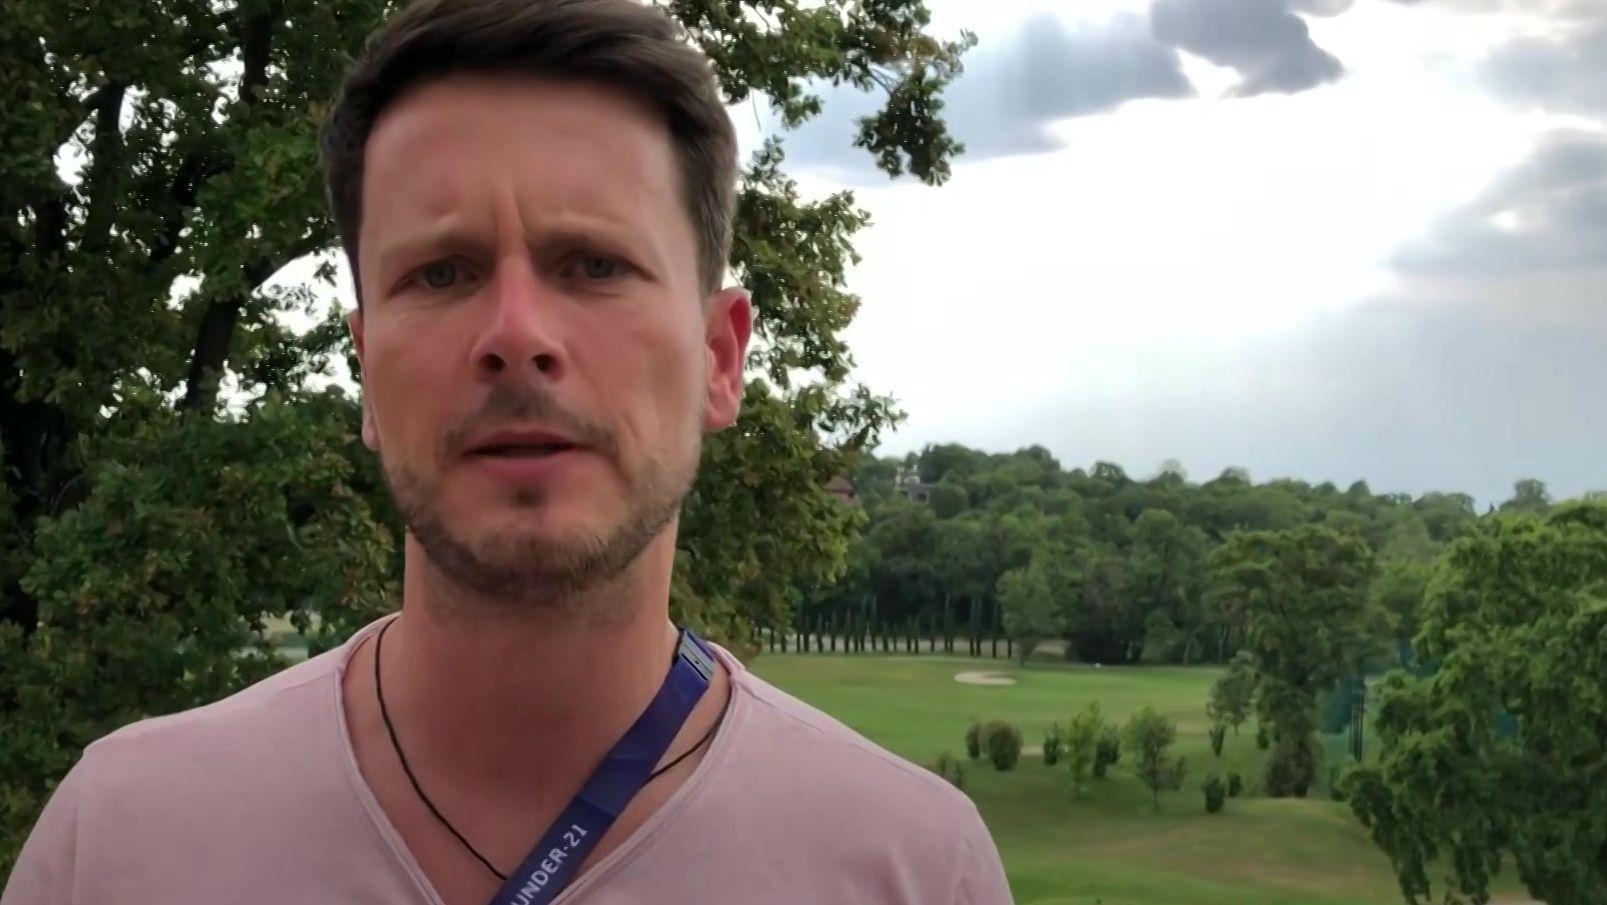 BR-Sportreporter Philipp Nagel